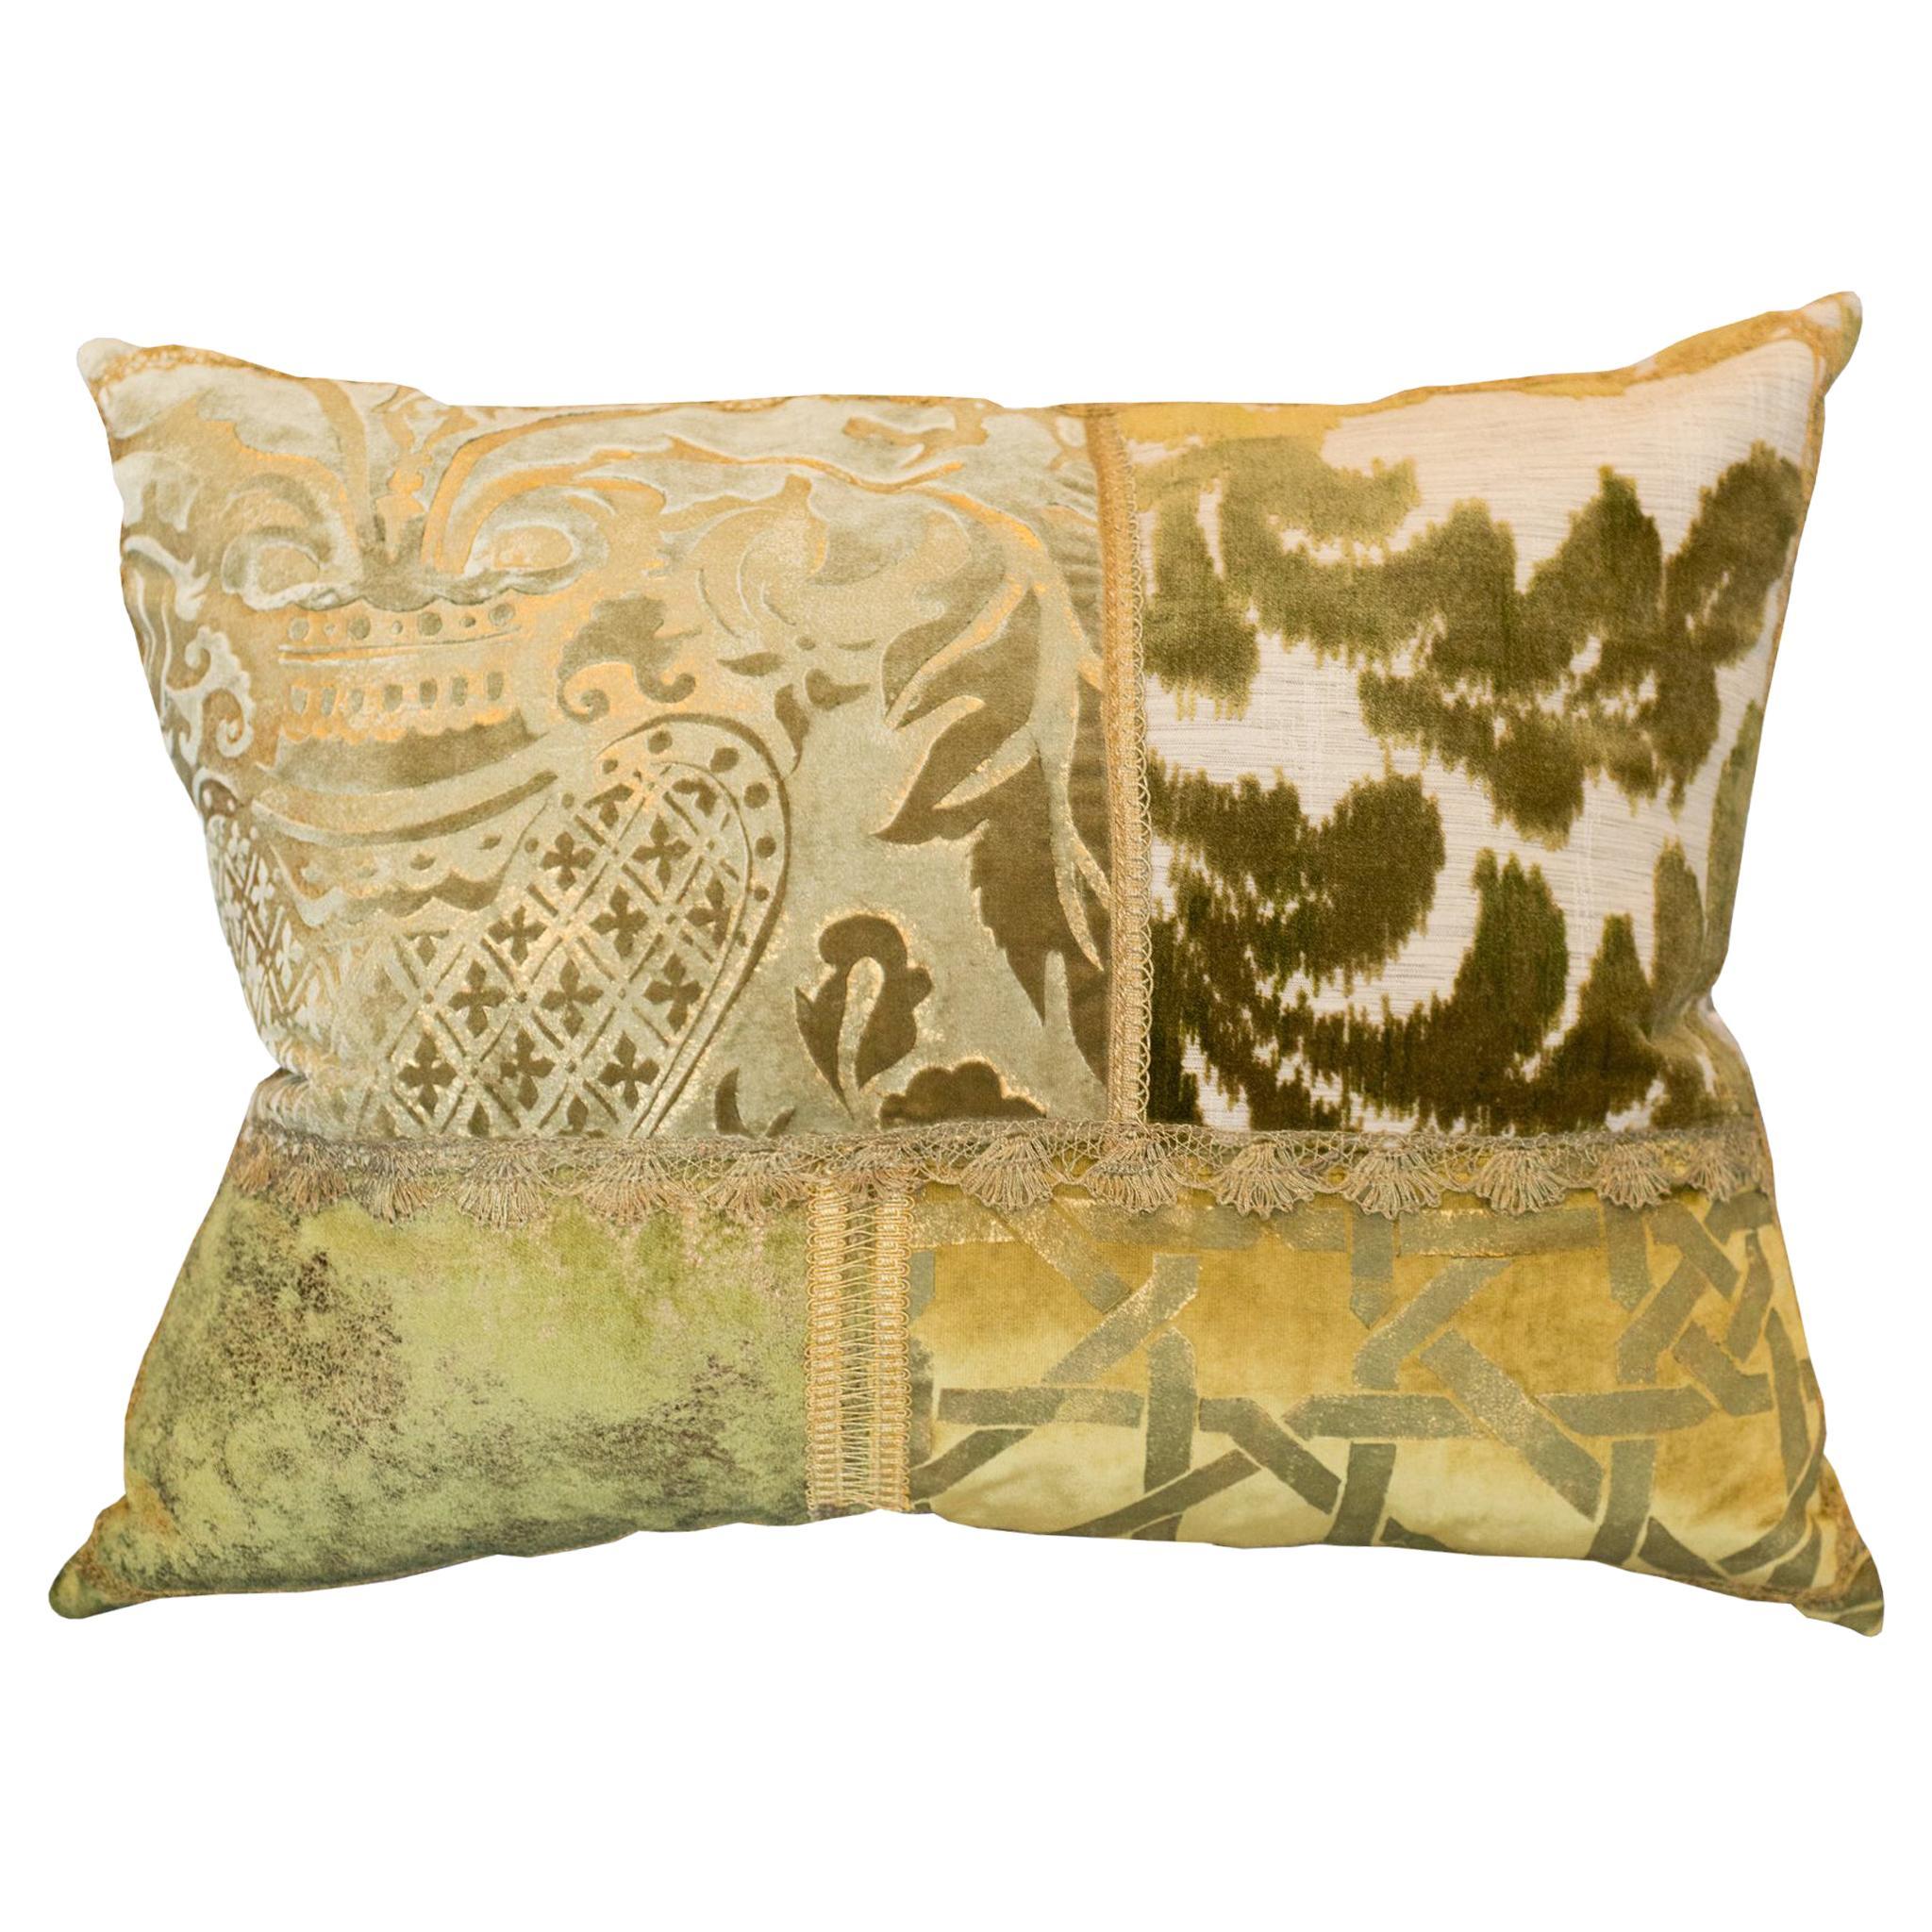 Studio Maison Nurita Patchwork Silk Velvet Pillow with Metallic Trims